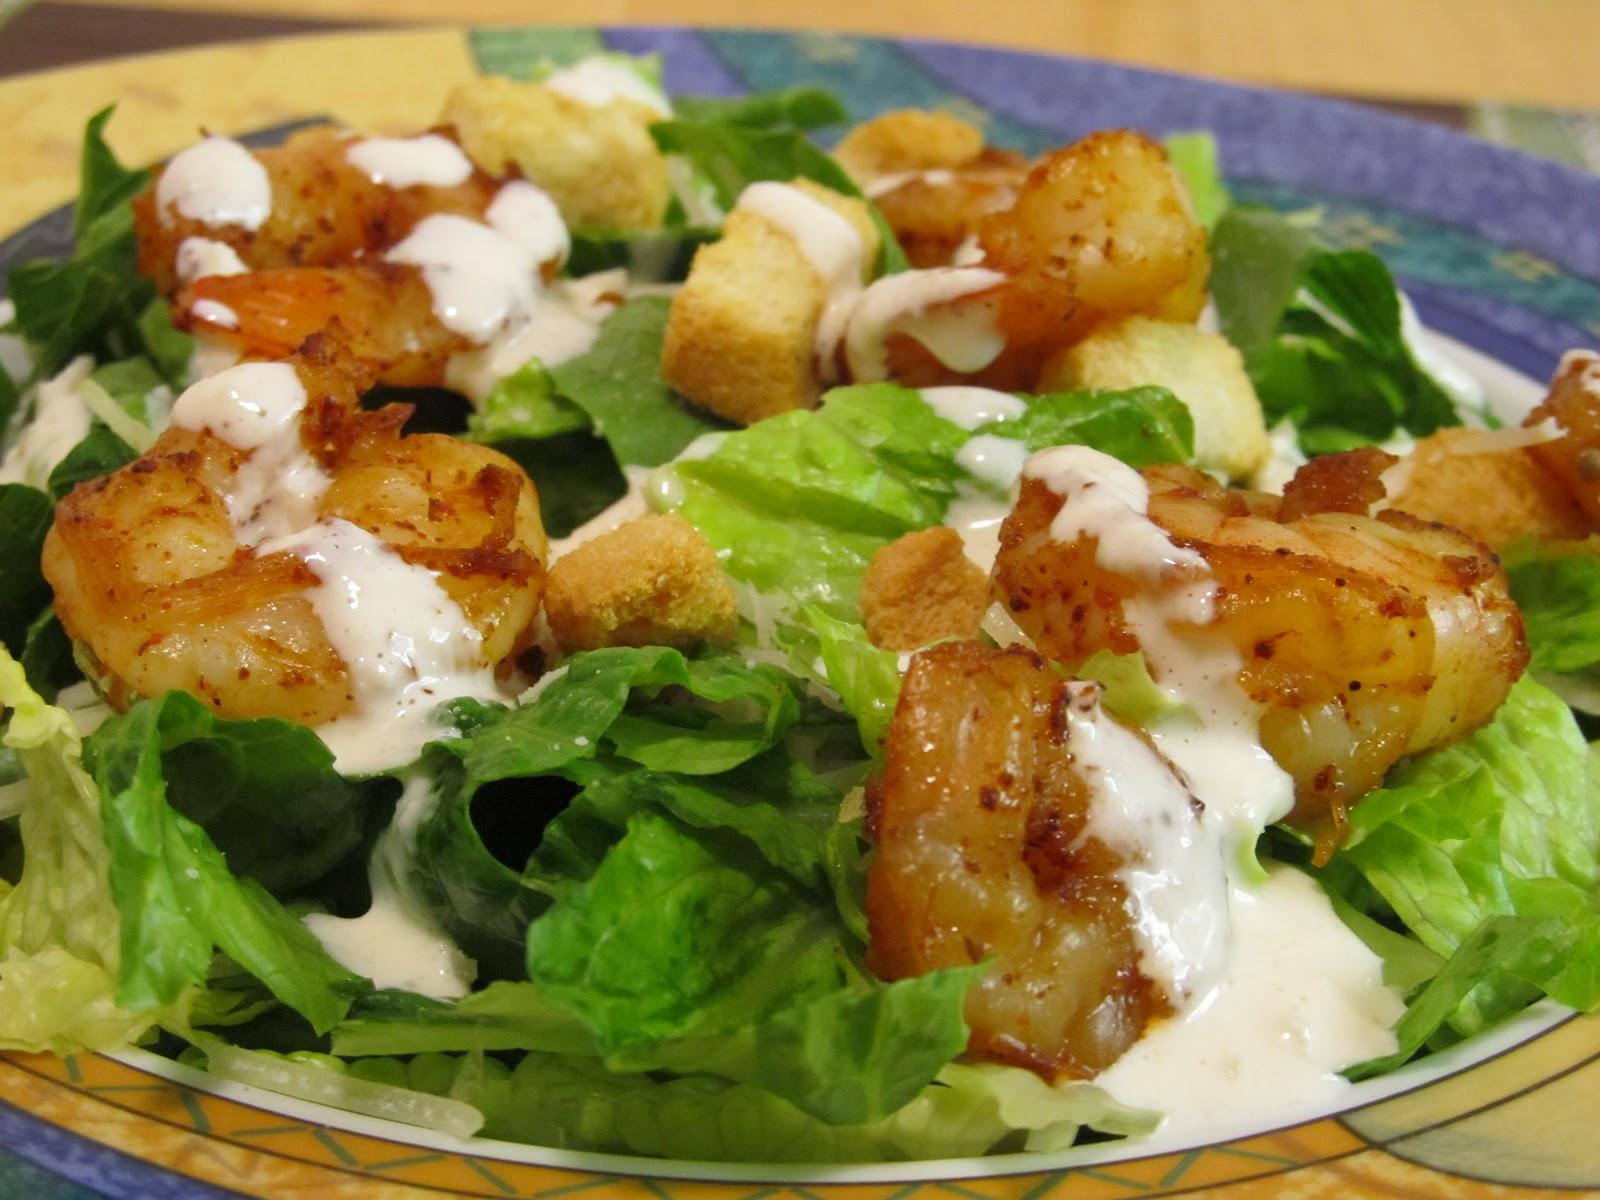 Самый вкусный рецепт цезаря с креветками